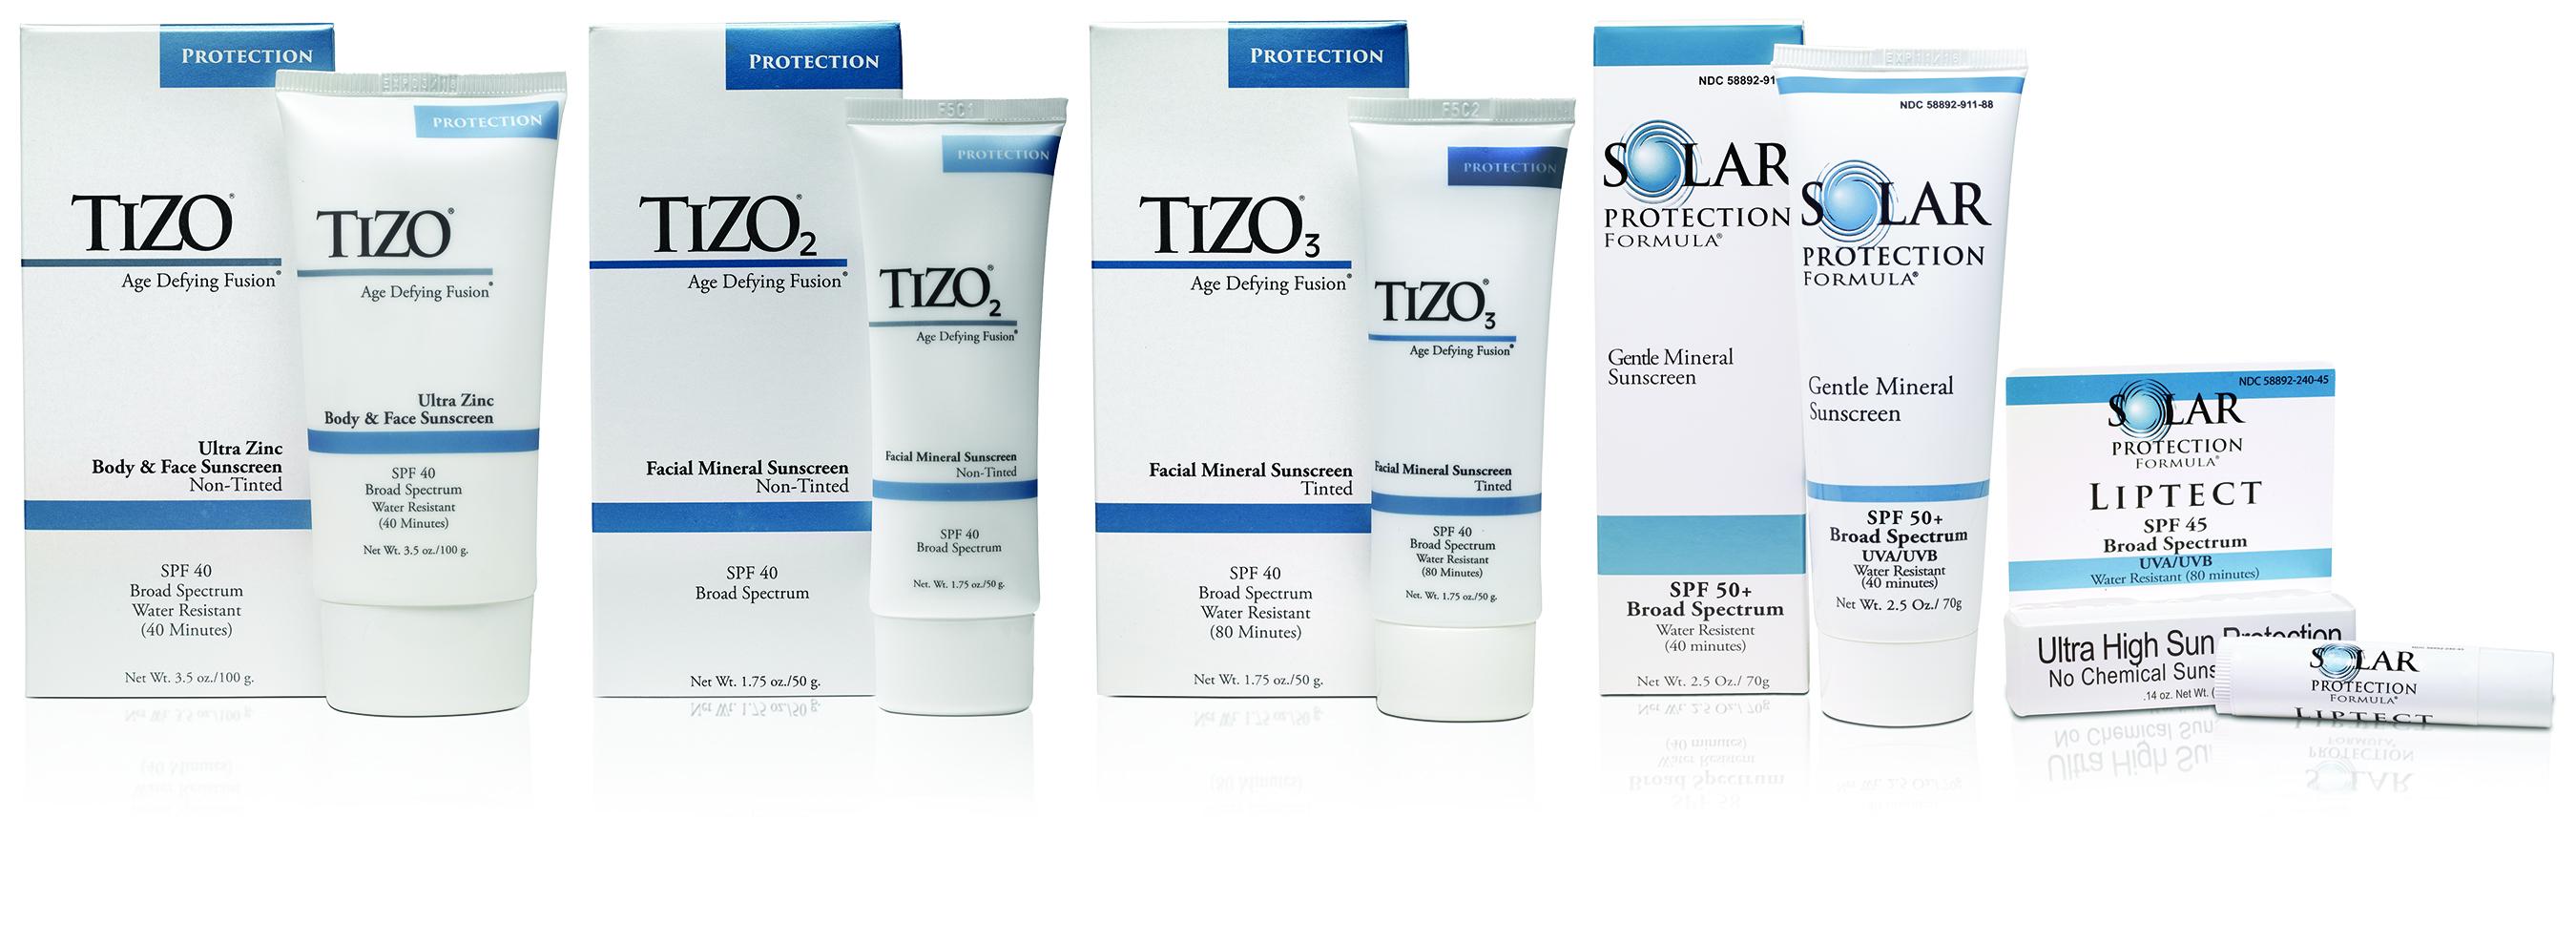 Medical-Grade Skin Care Products TiZO